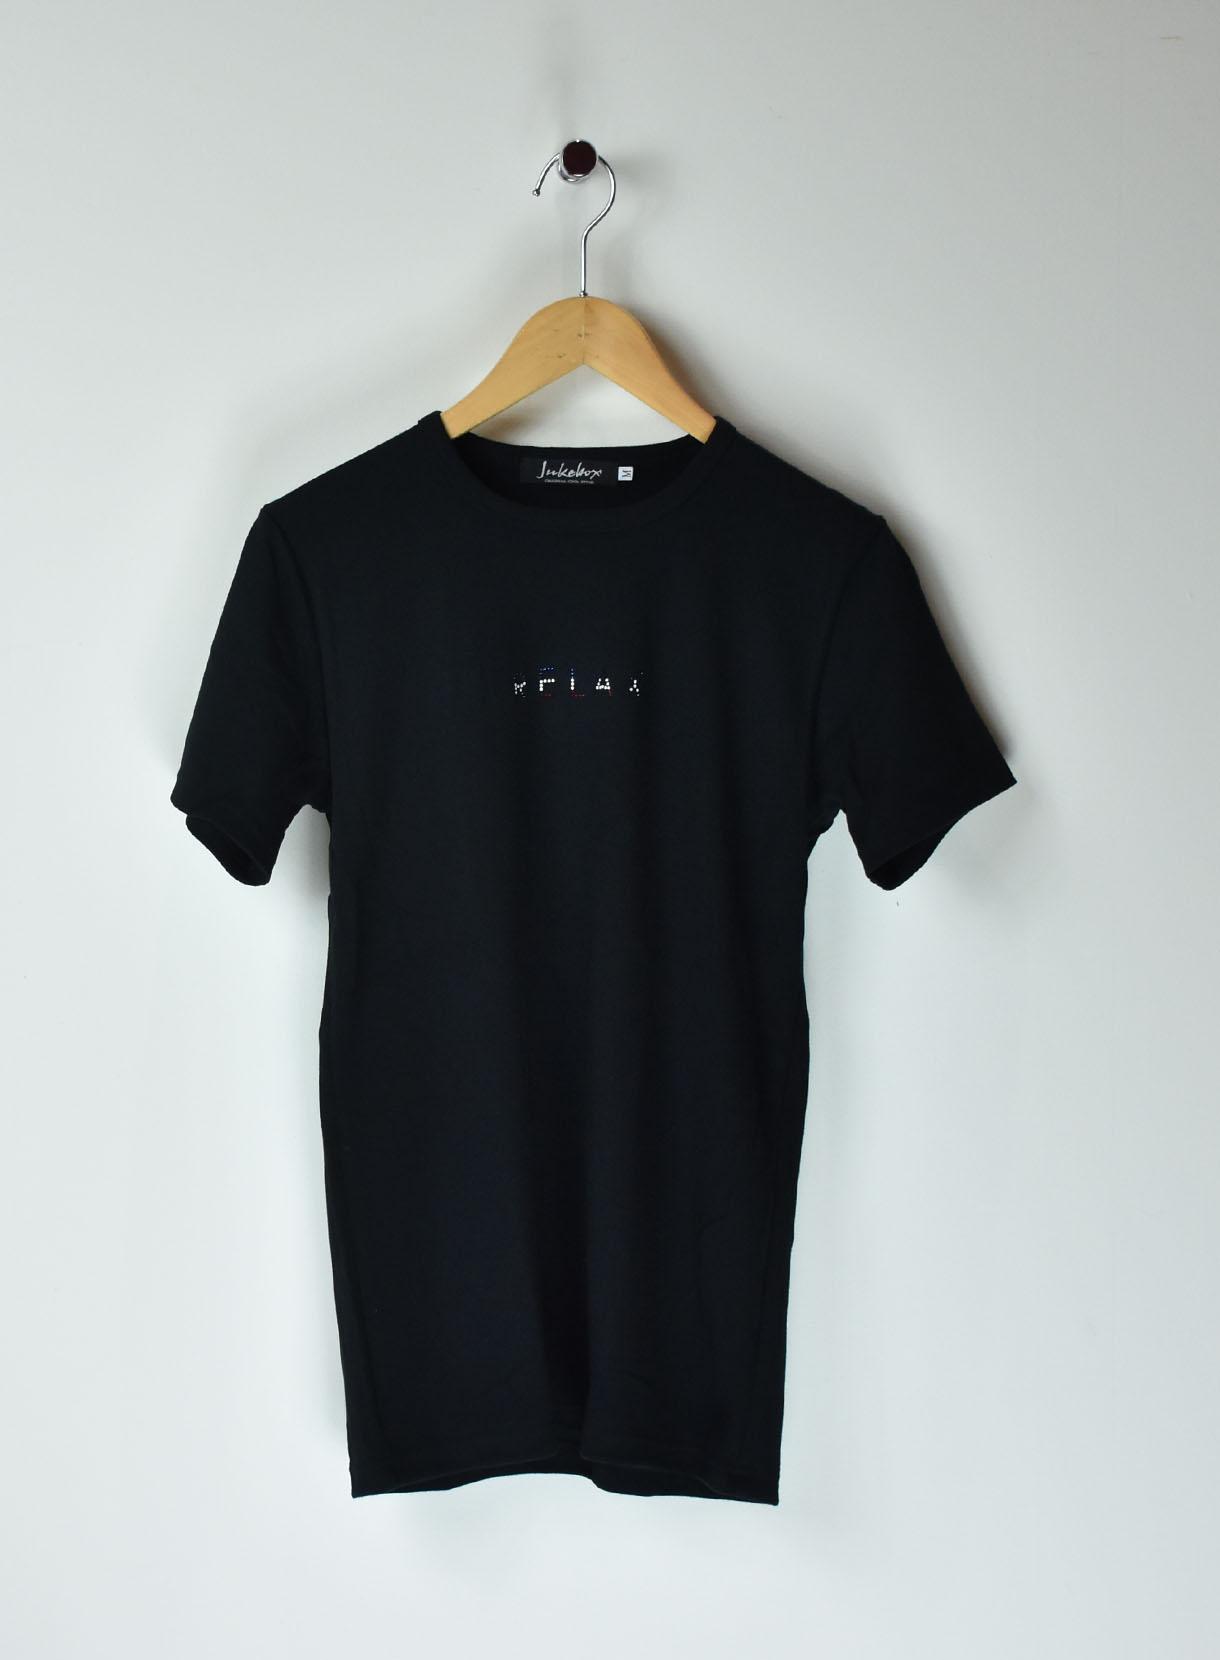 JUKEBOX SWAROVSKI Tシャツ(フロント relax Verticalトリコロール柄)